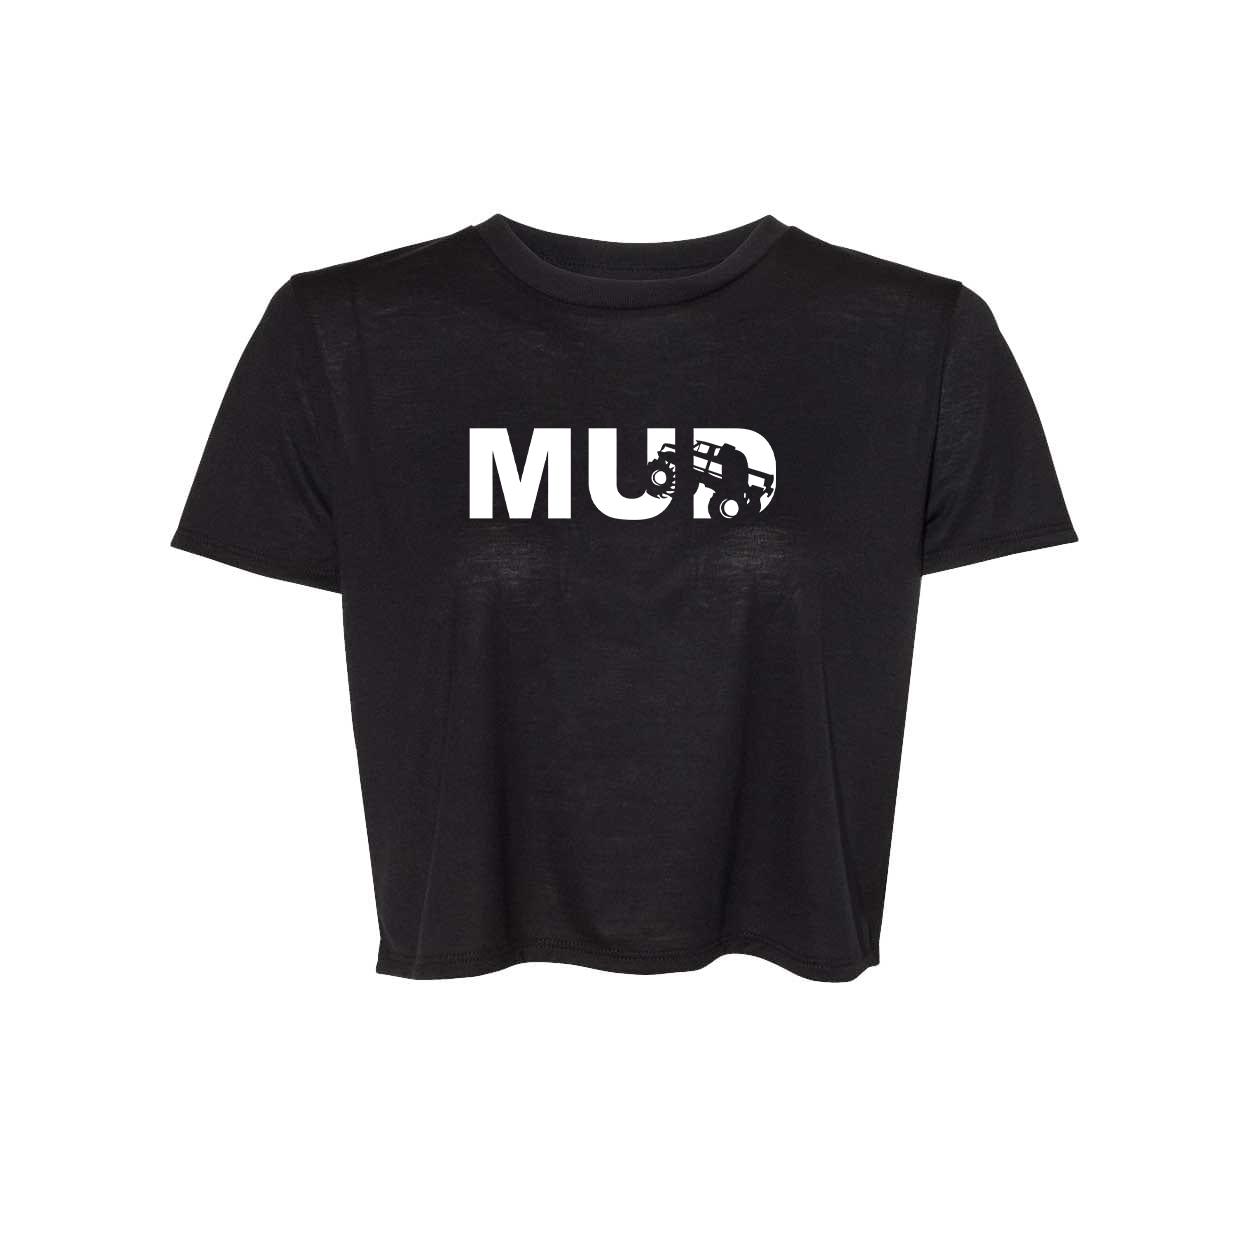 Mud Truck Logo Classic Womens Flowy Cropped Tee Black (White Logo)